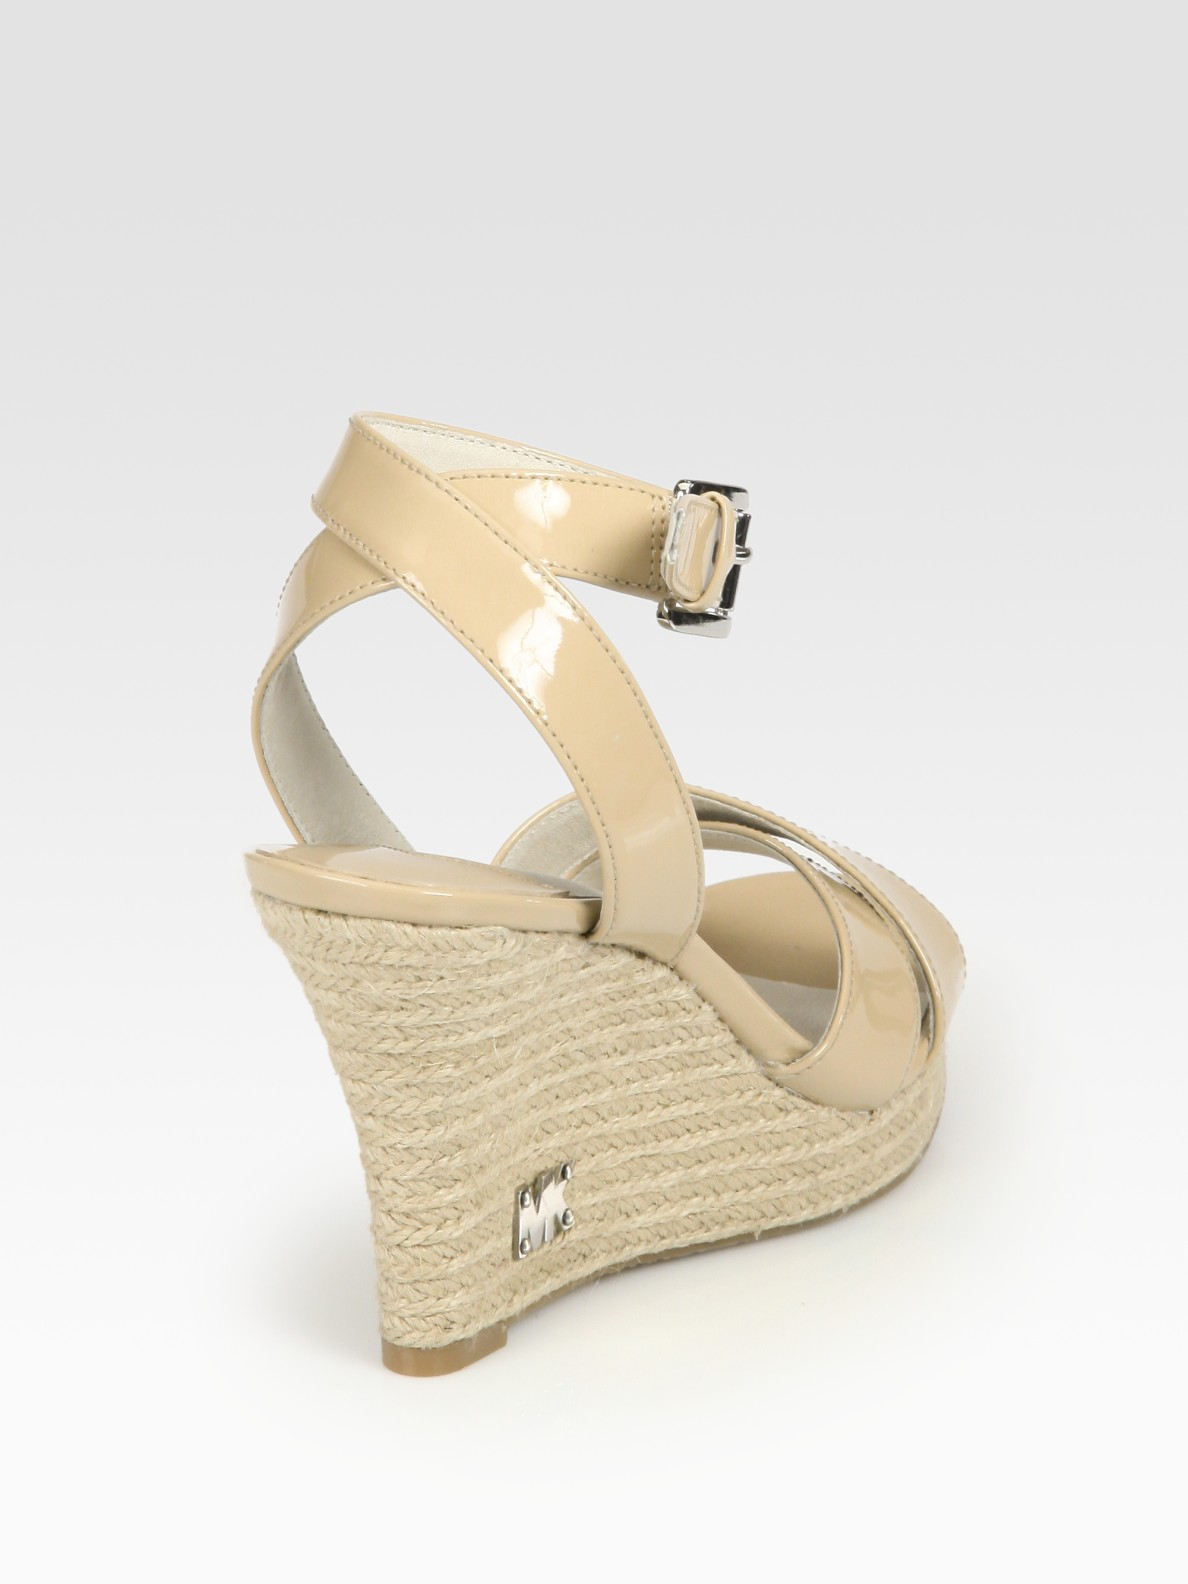 7e3e0f125c8 Lyst - MICHAEL Michael Kors Kami Patent Leather Espadrille Wedge ...